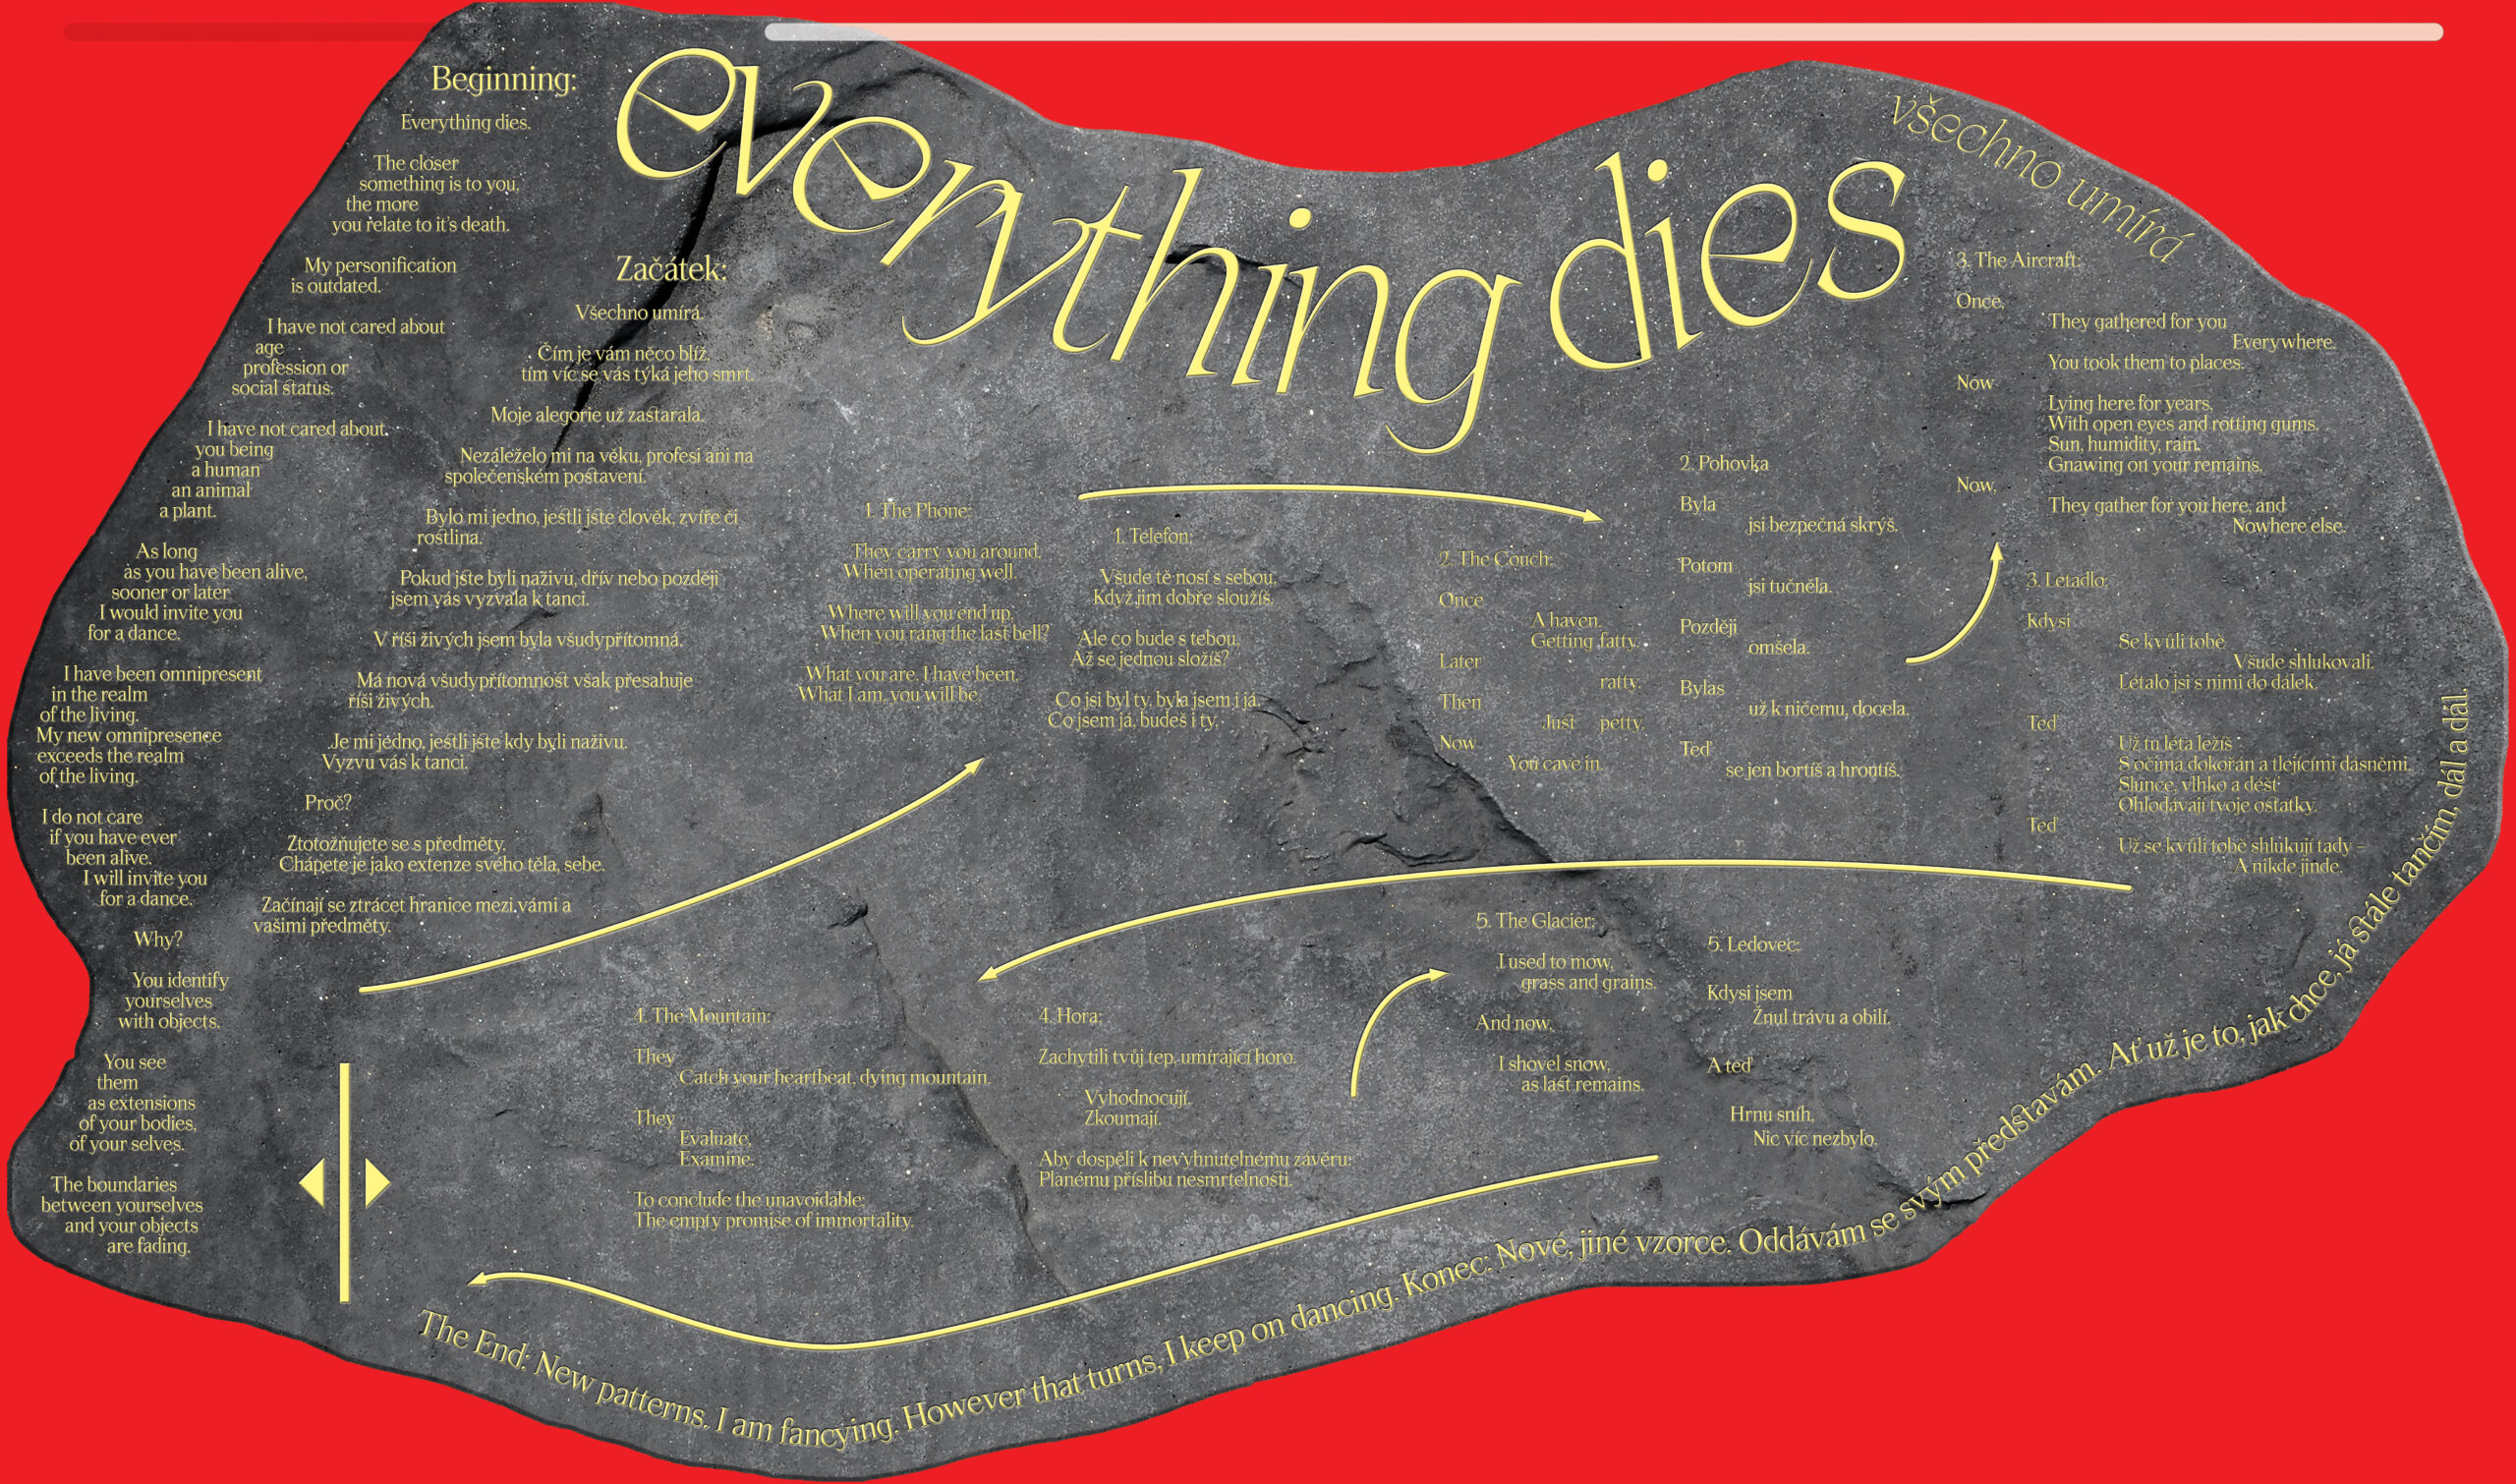 Everything Dies. Všechno Umírá.